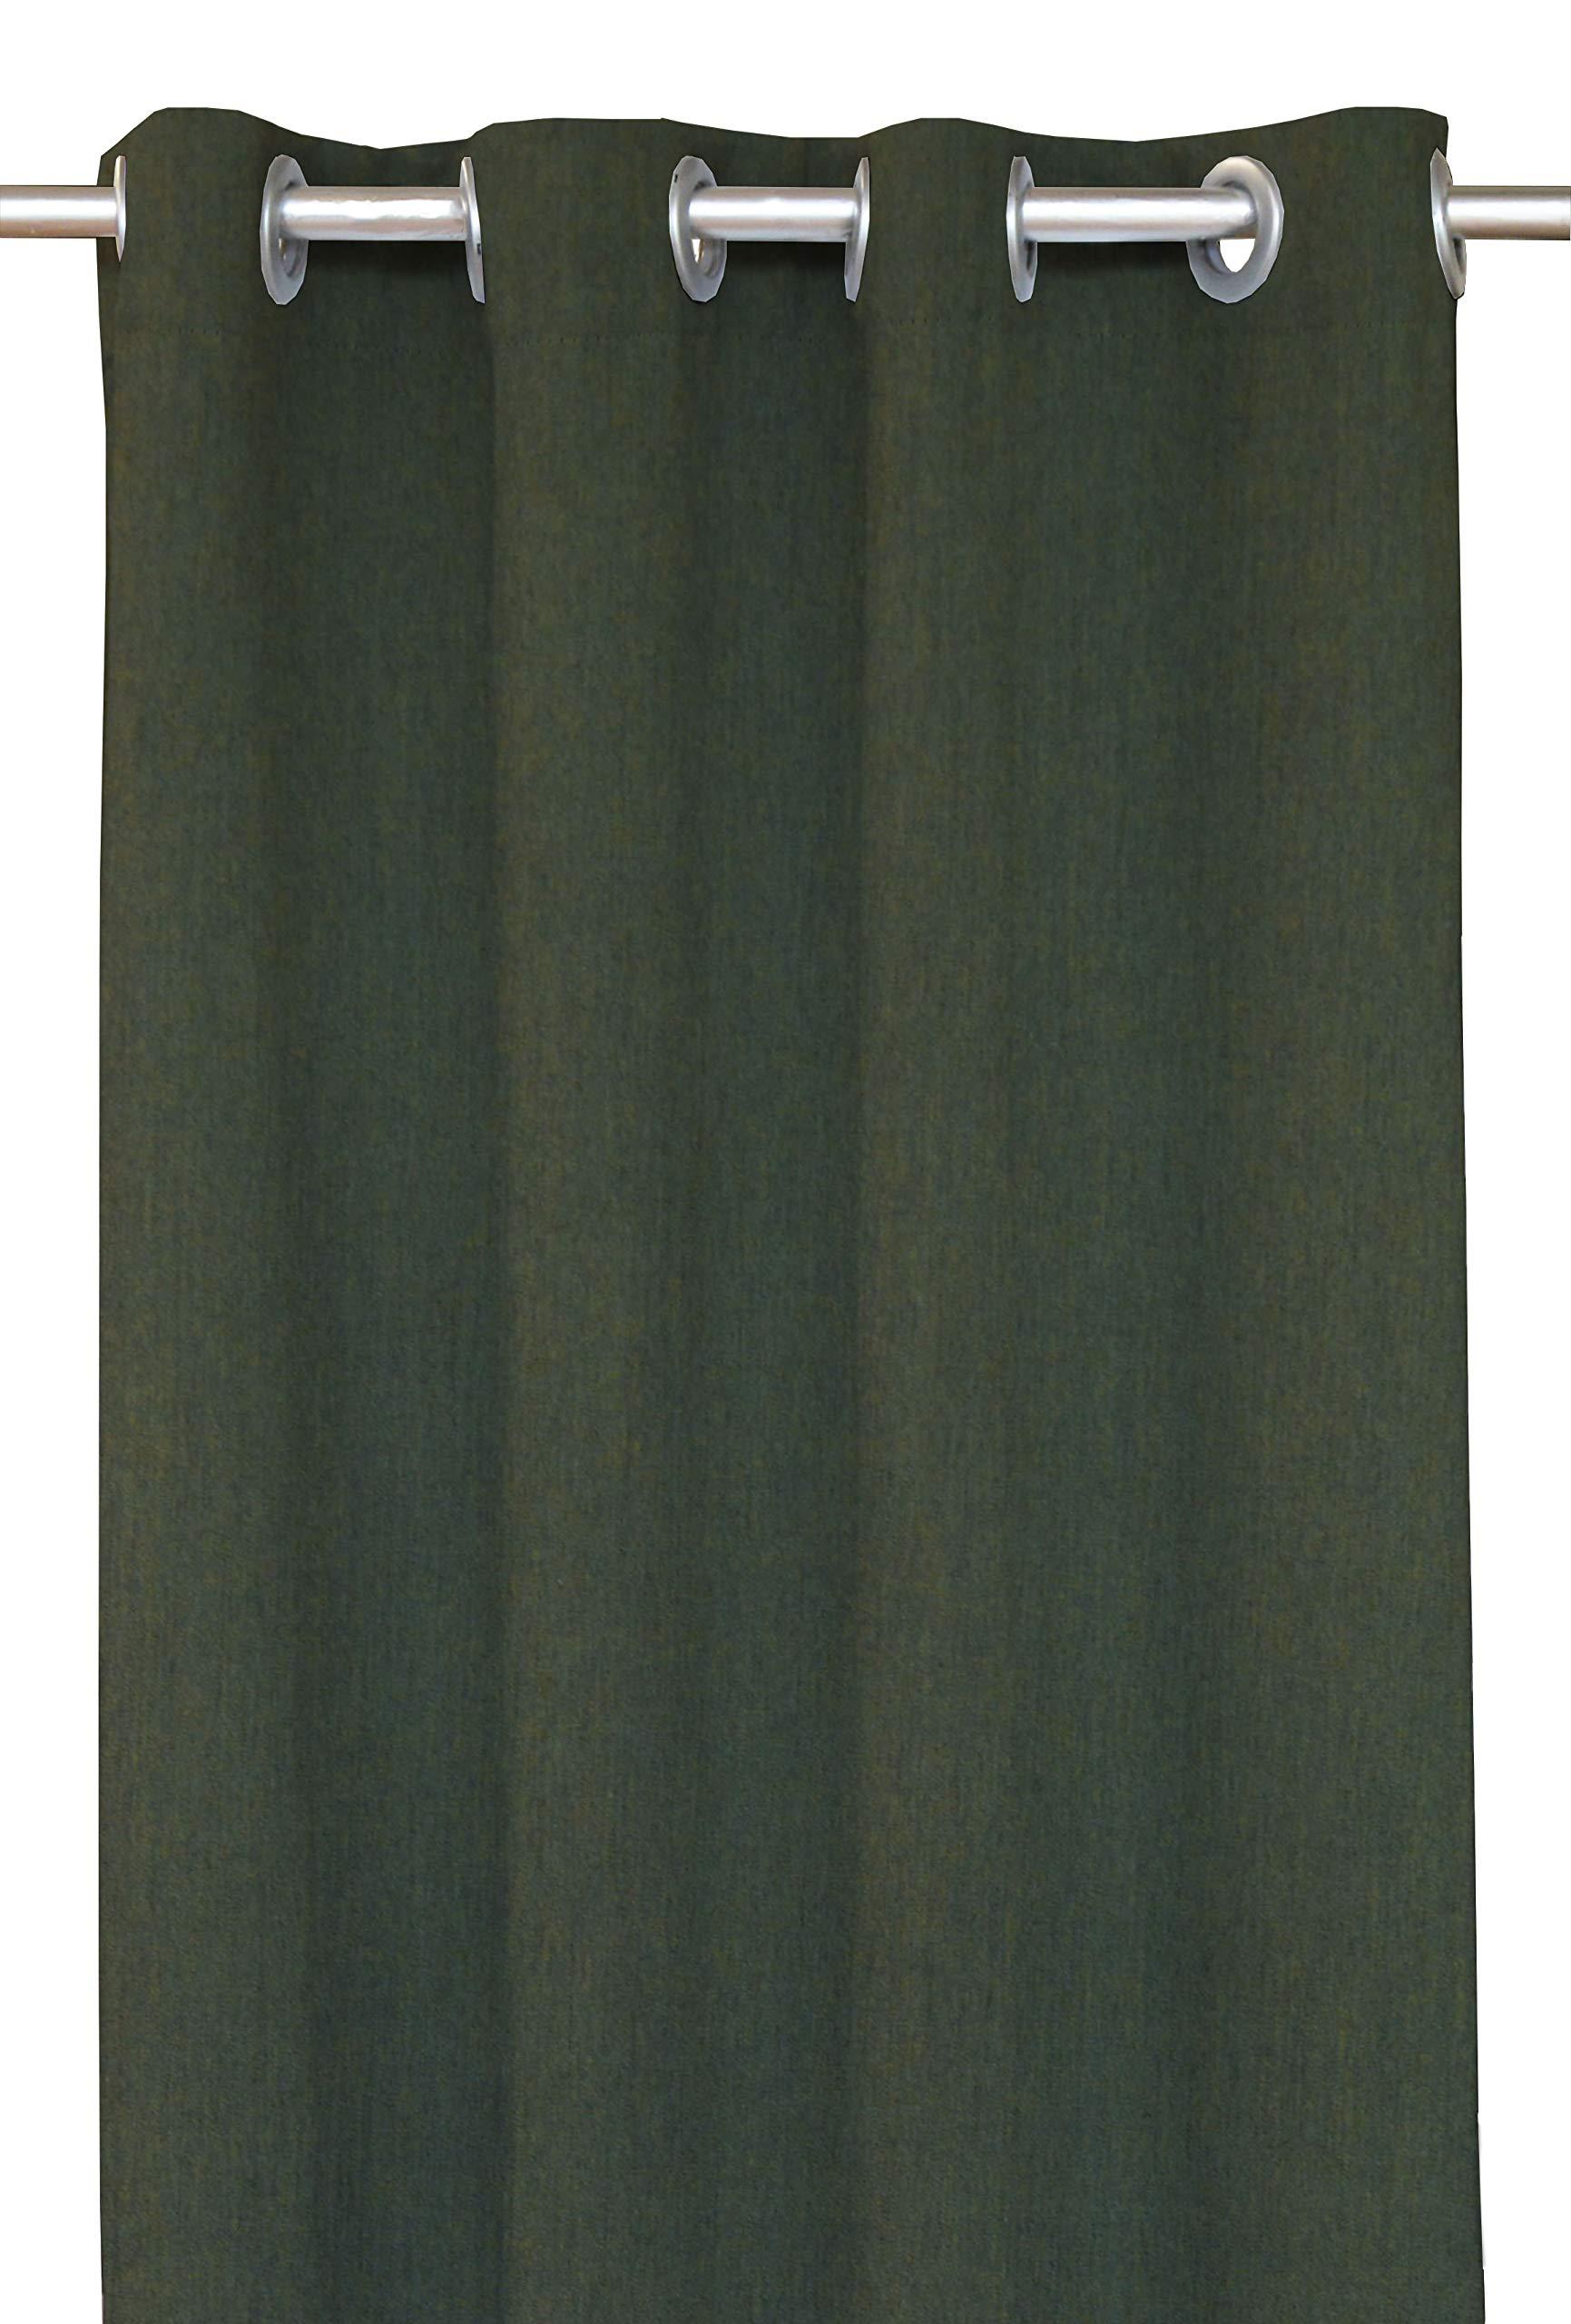 RSH Décor Indoor/Outdoor Brush Nickel Grommet Curtain Panel Made from Sunbrella Canvas Fern (50'' W x 120'' L)